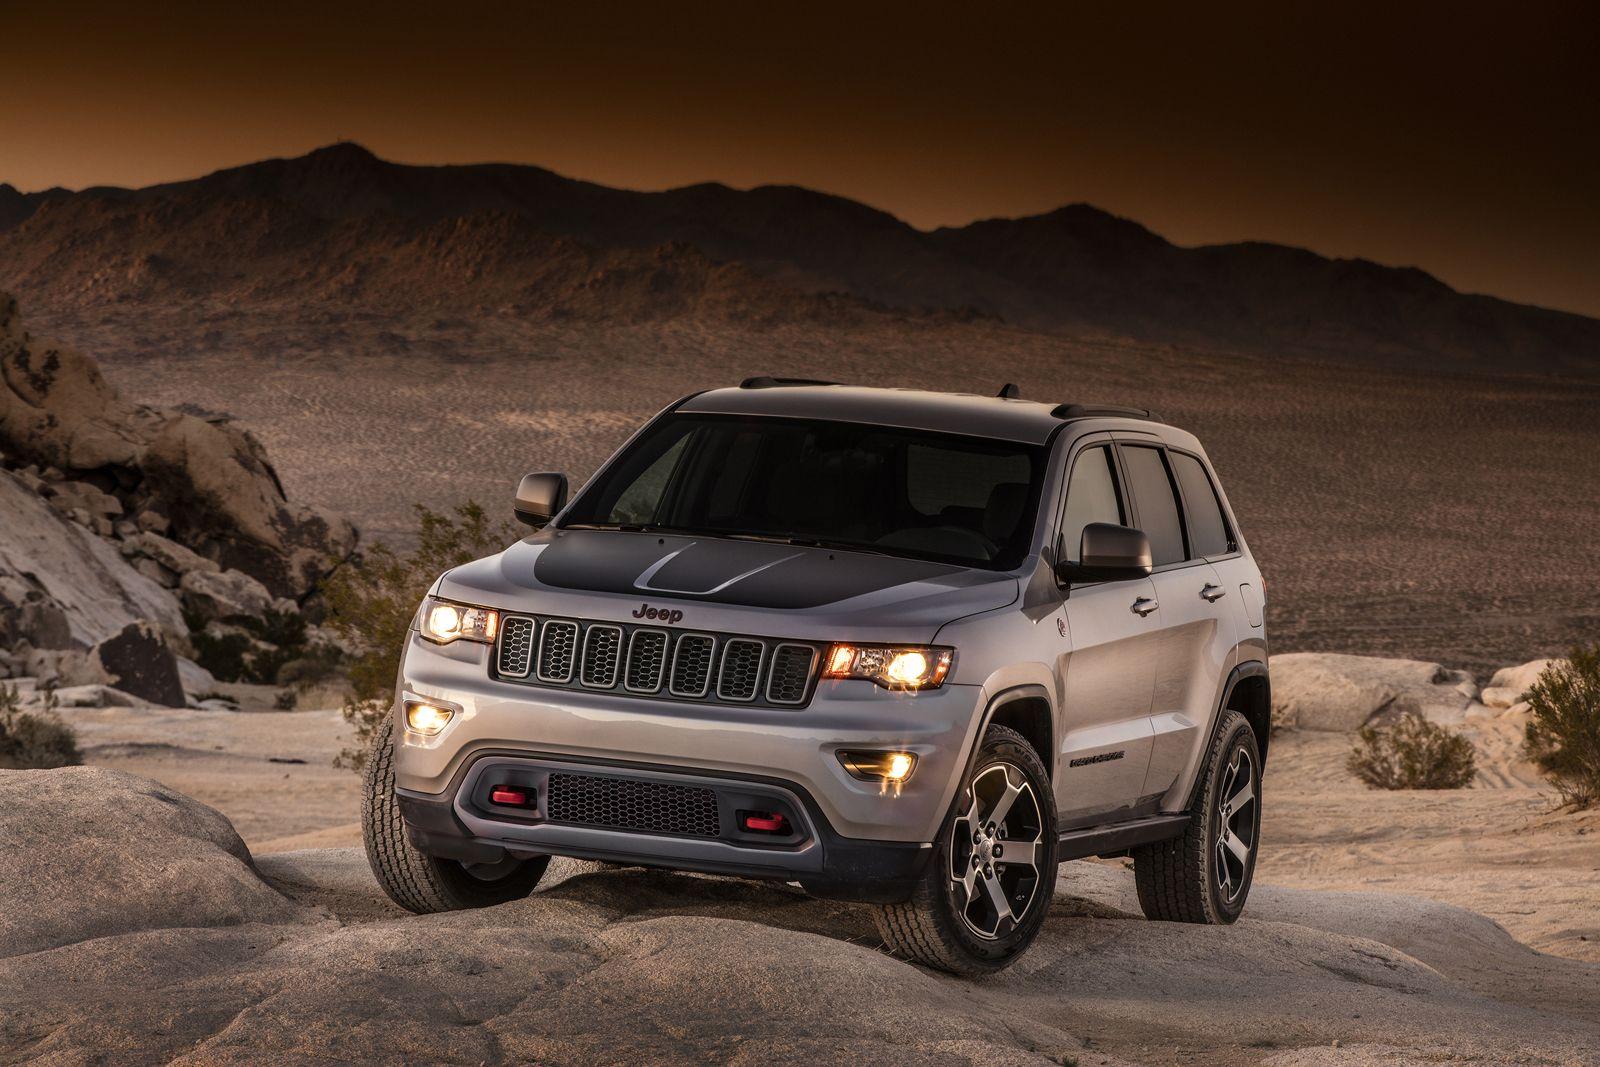 2017 jeep grand cherokee 4x4 earns 5 star nhtsa safety rating rwd model gets